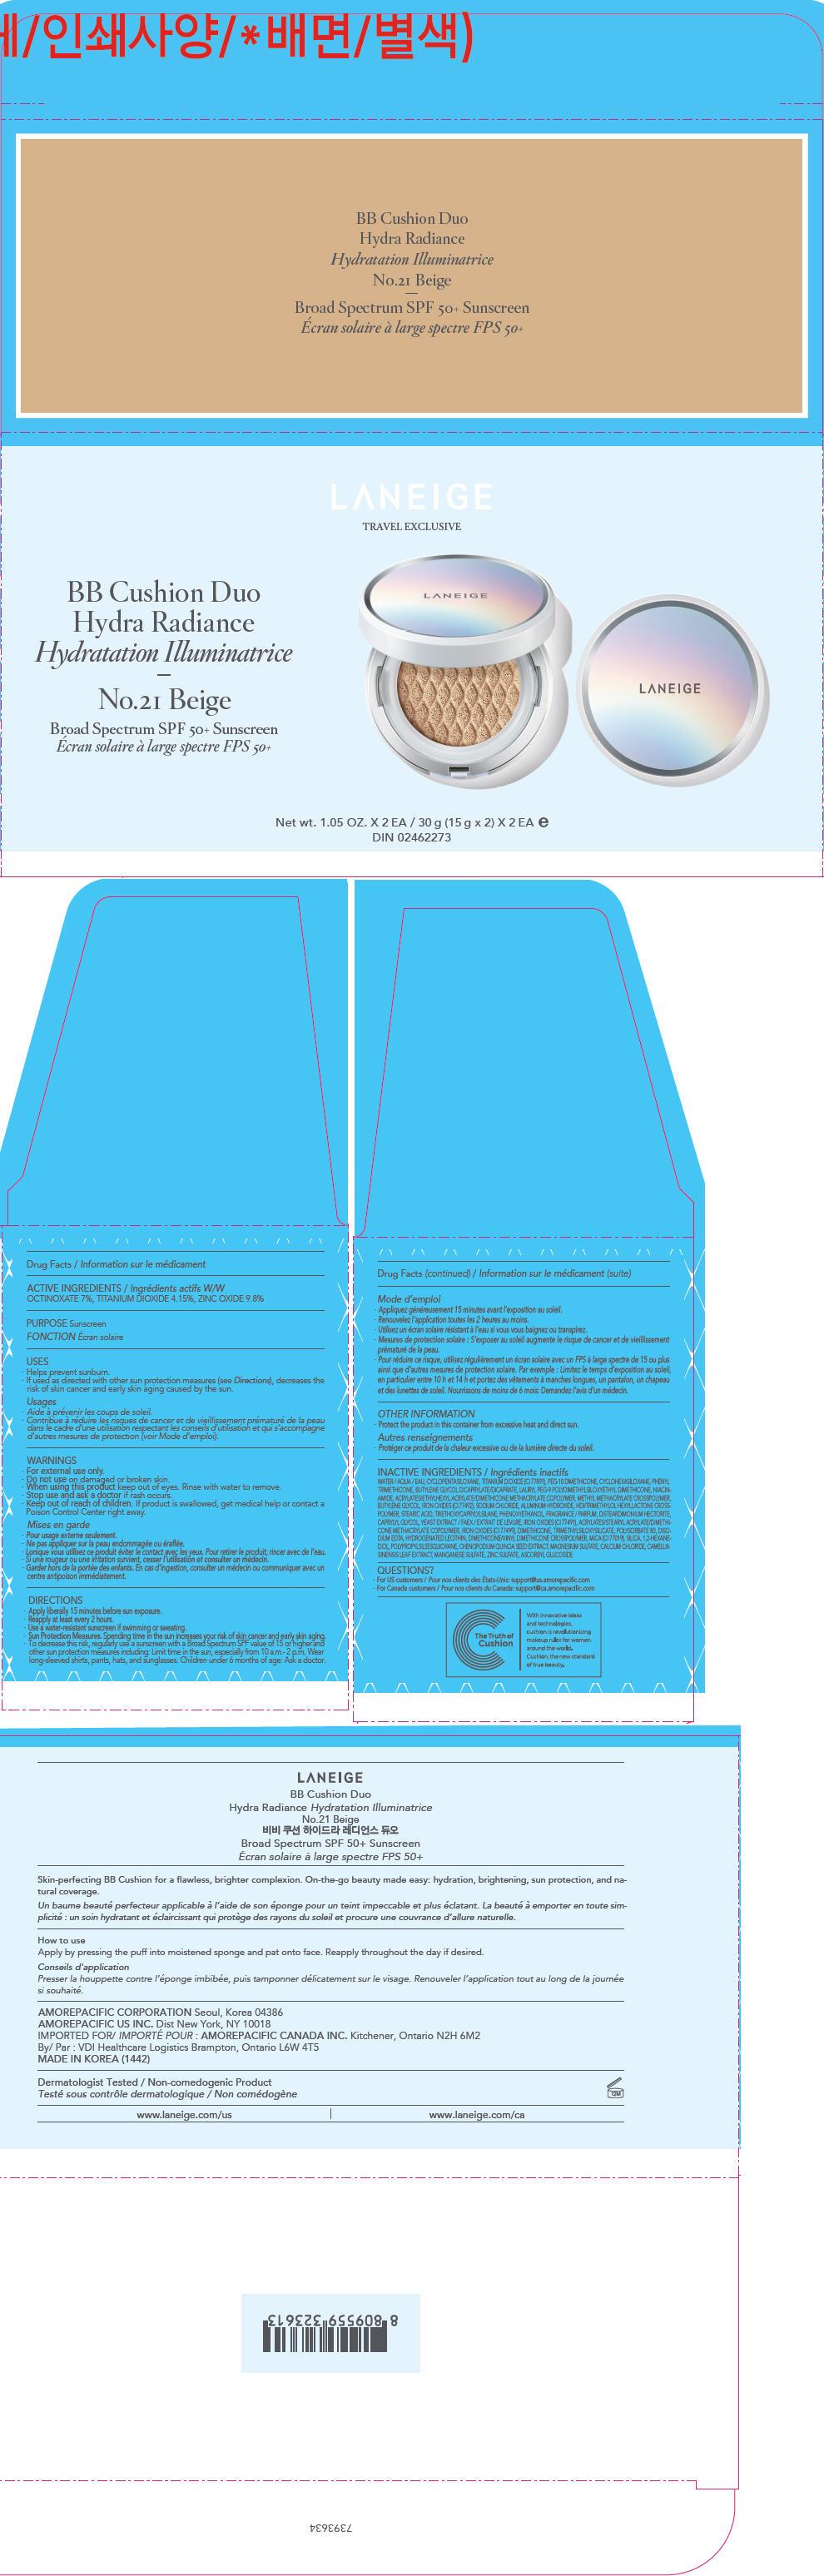 PRINCIPAL DISPLAY PANEL - x 2 (15 g x 2 Container Carton) Carton - No.21 Beige